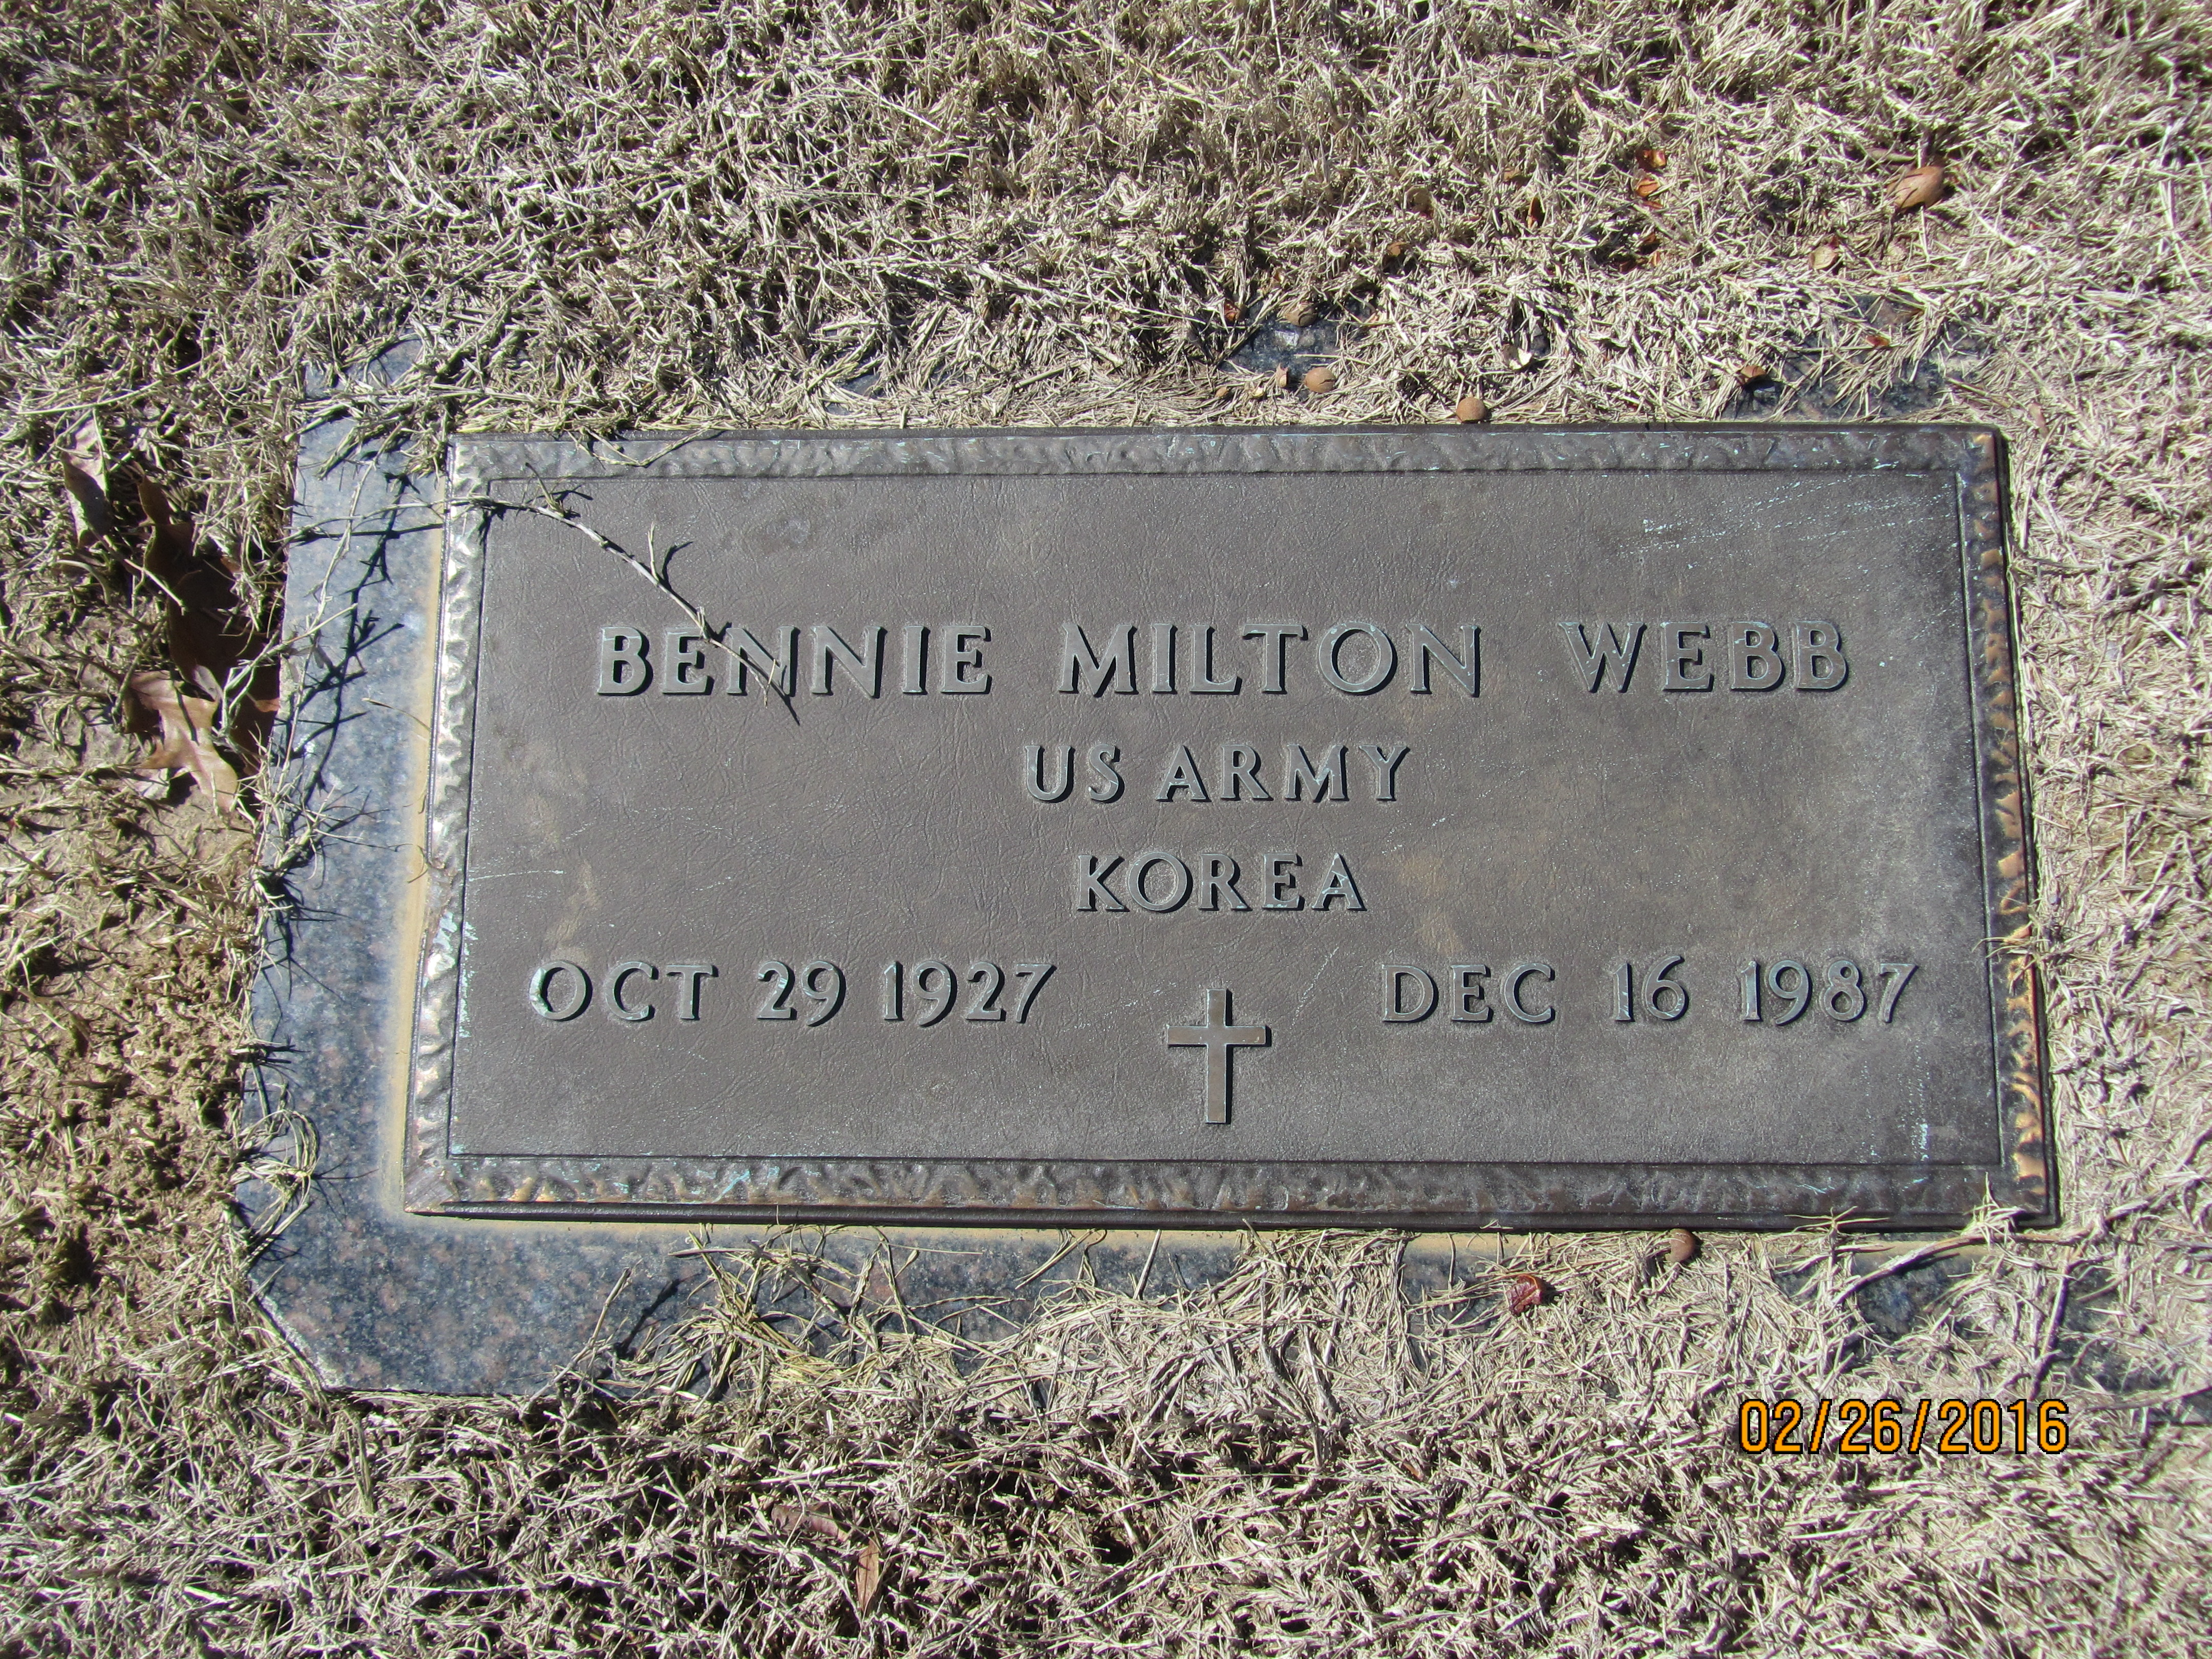 Bennie Milton Webb